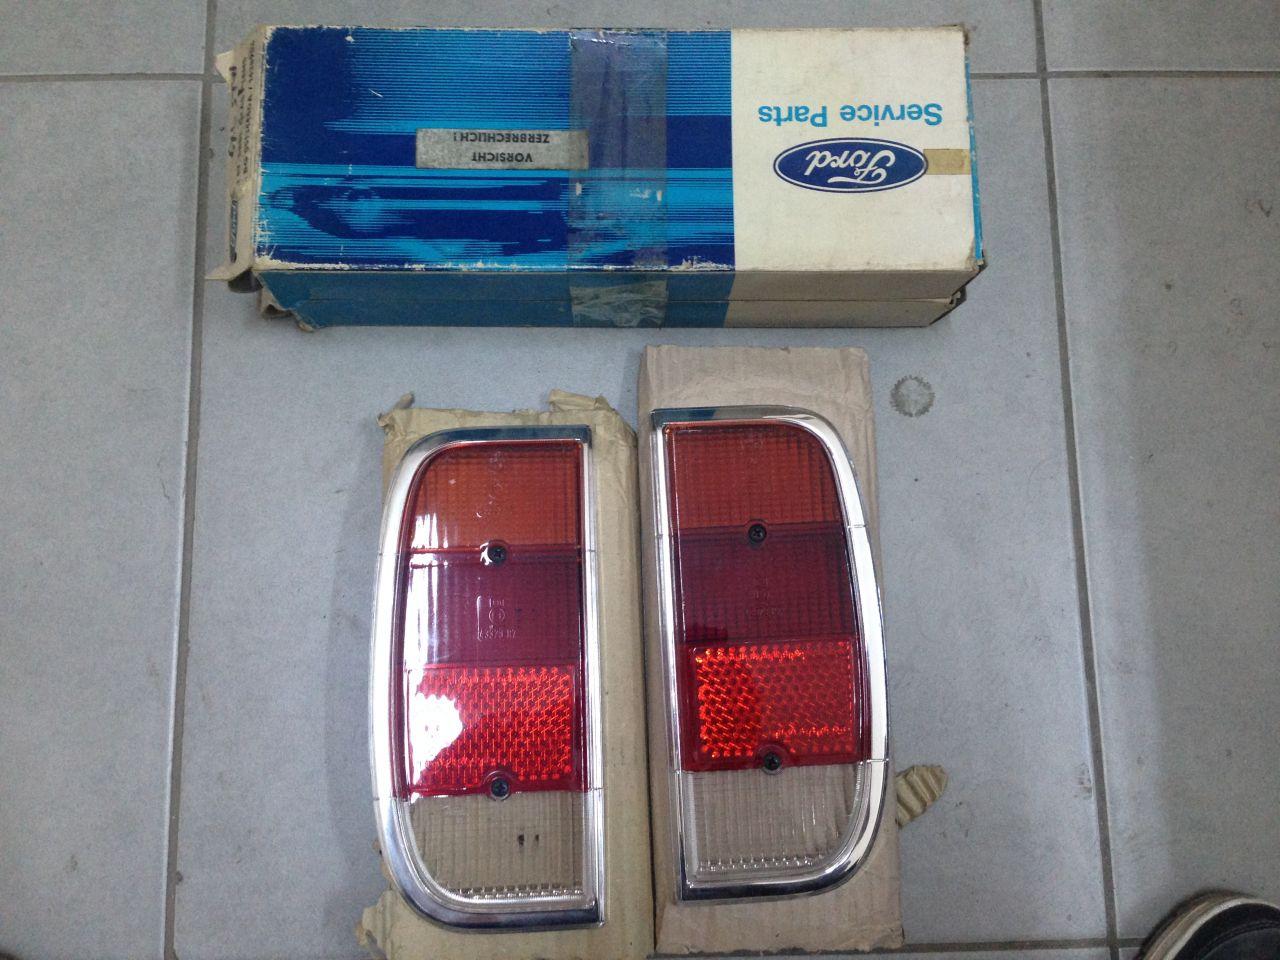 Taunus Gxl Stw Stop Cami Takim Far Sinyal Stop Fomoco Ford Yedek